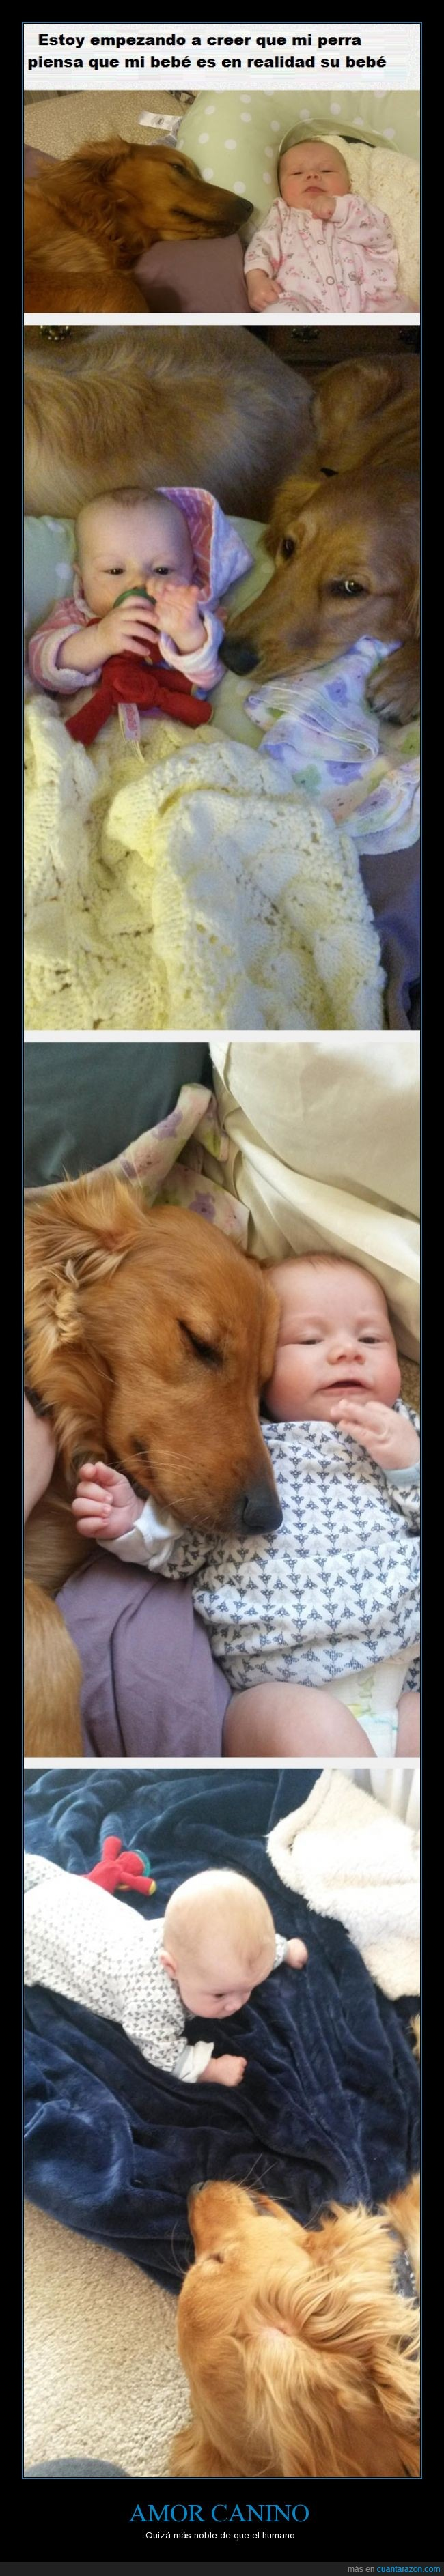 amor,bebe,canino,hijo,niño,perro